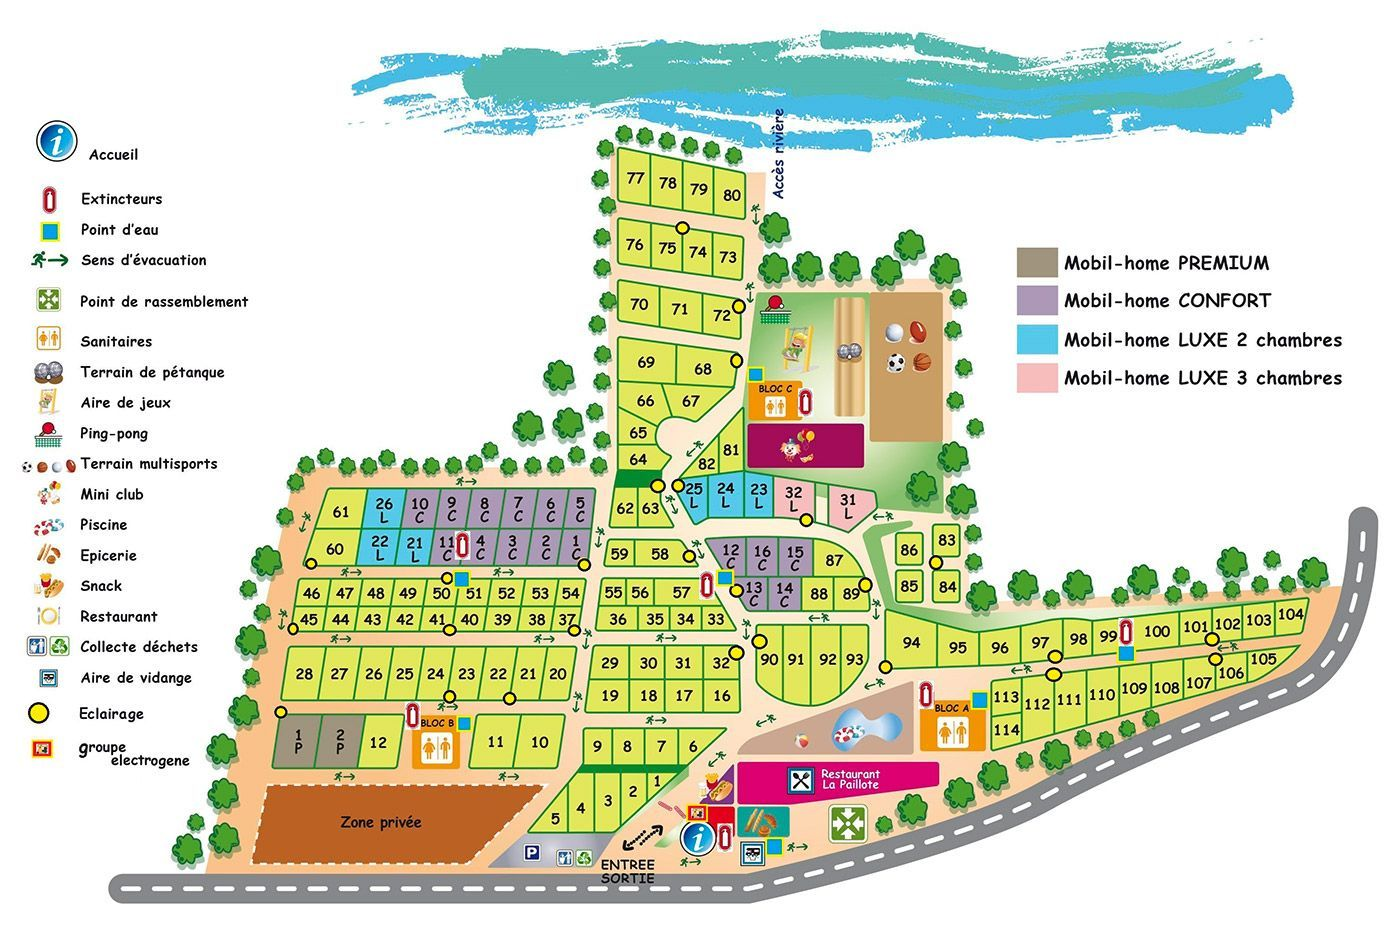 Camp-site map